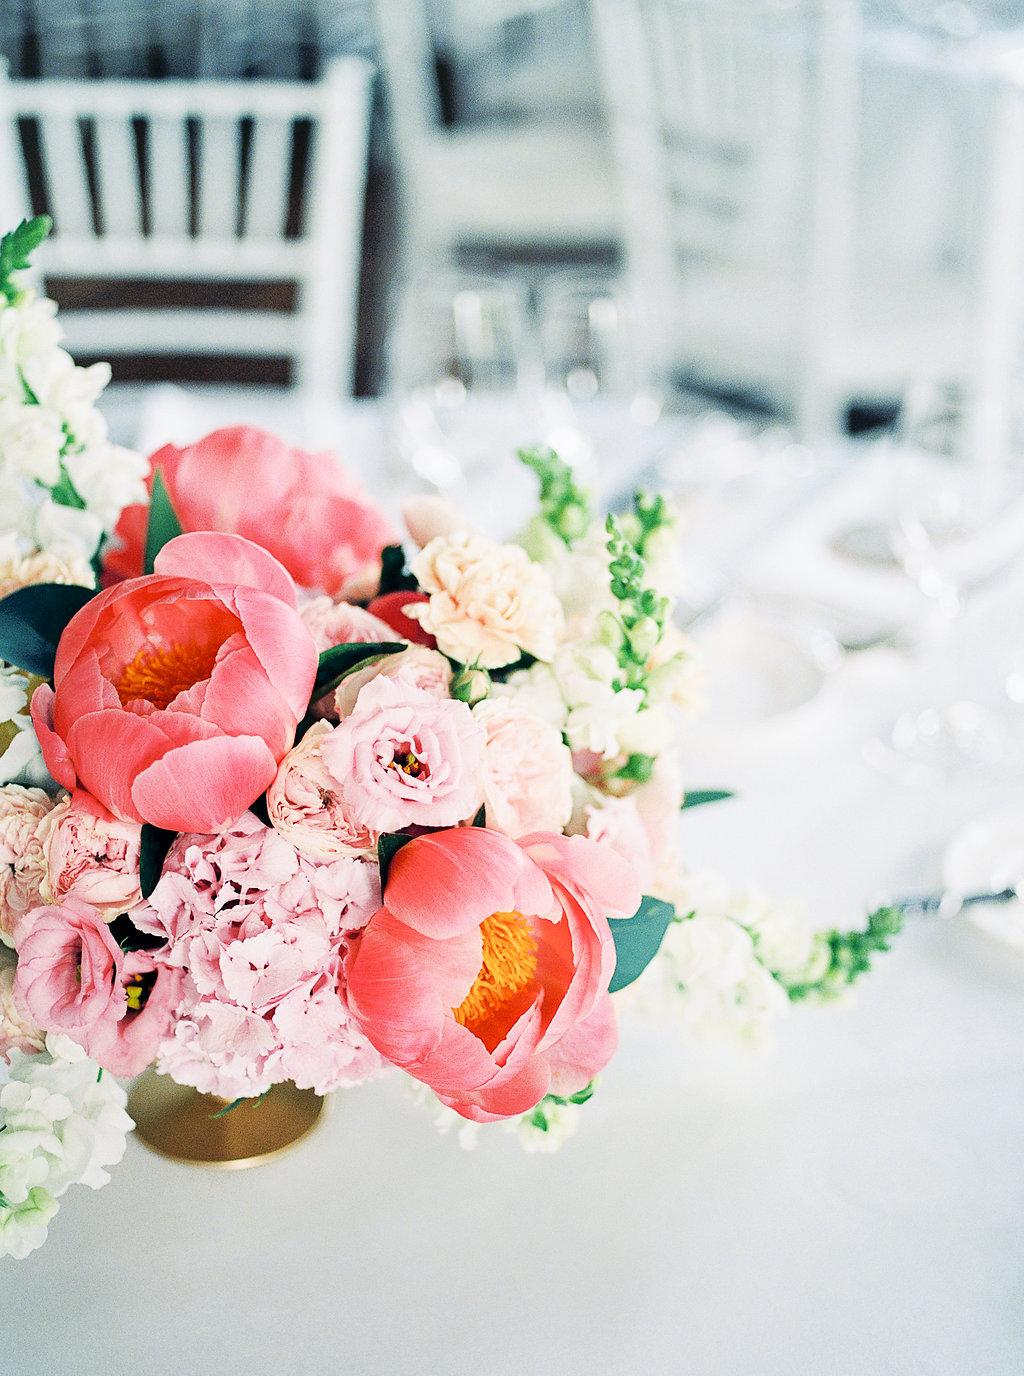 Luxe Navy and Pink Wedding at Schloss Fuschl in Austria by Tanja Kibogo9.JPG